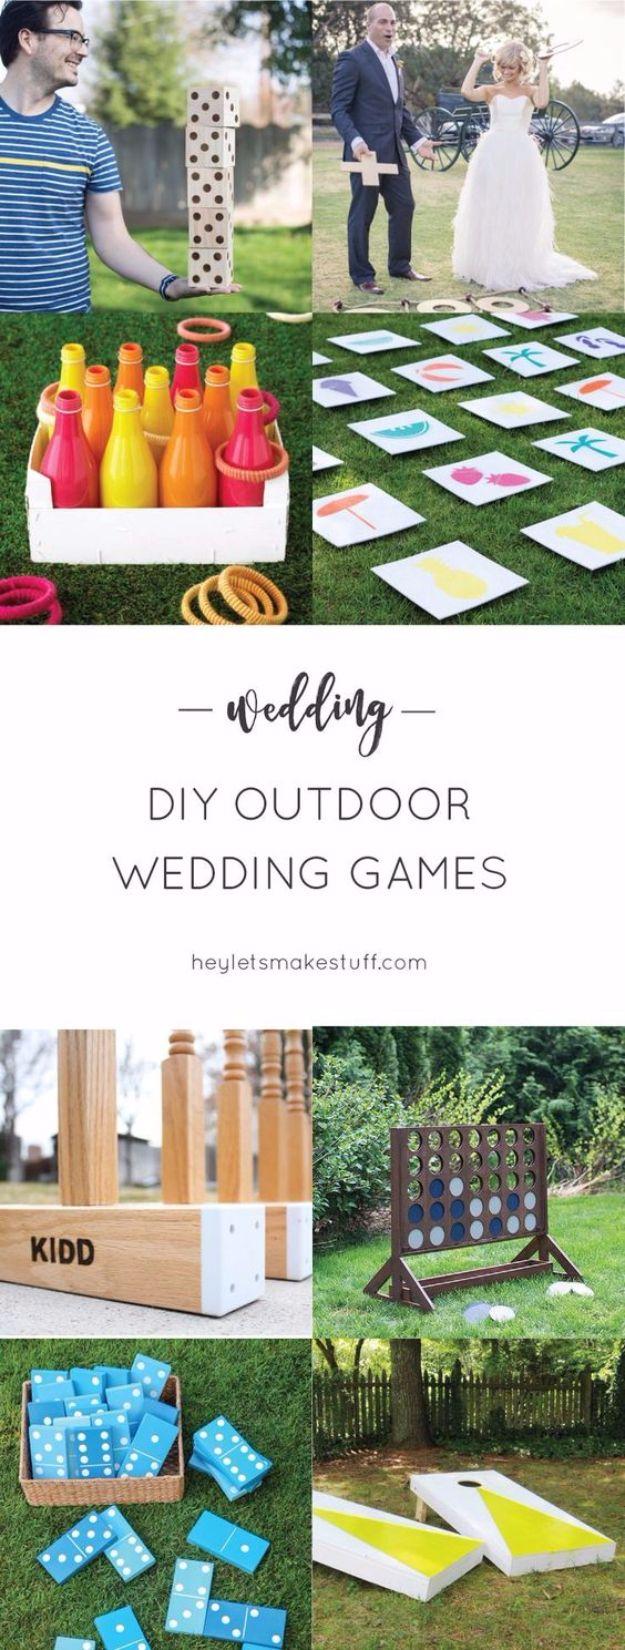 Easy Diy Wedding Decorations 41 Best Diy Ideas For Your Outdoor Wedding